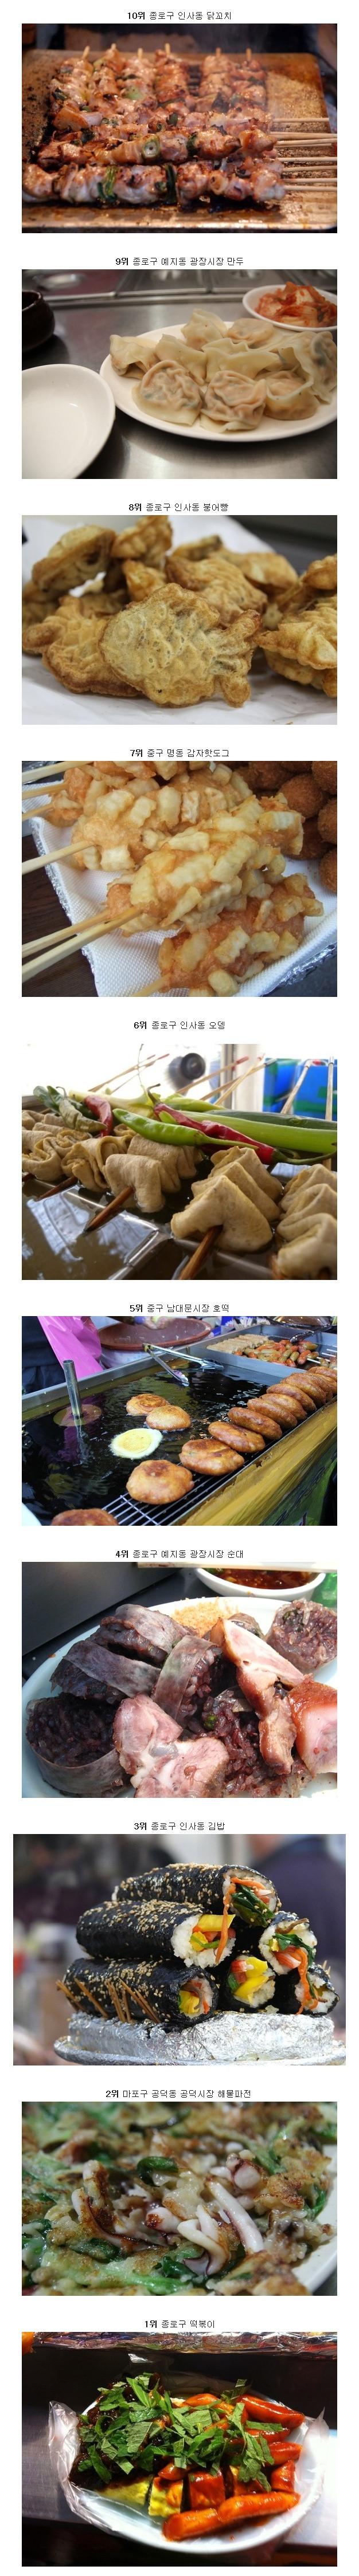 cnn이 선정한 서울의 대표적인 길거리음식.jpg